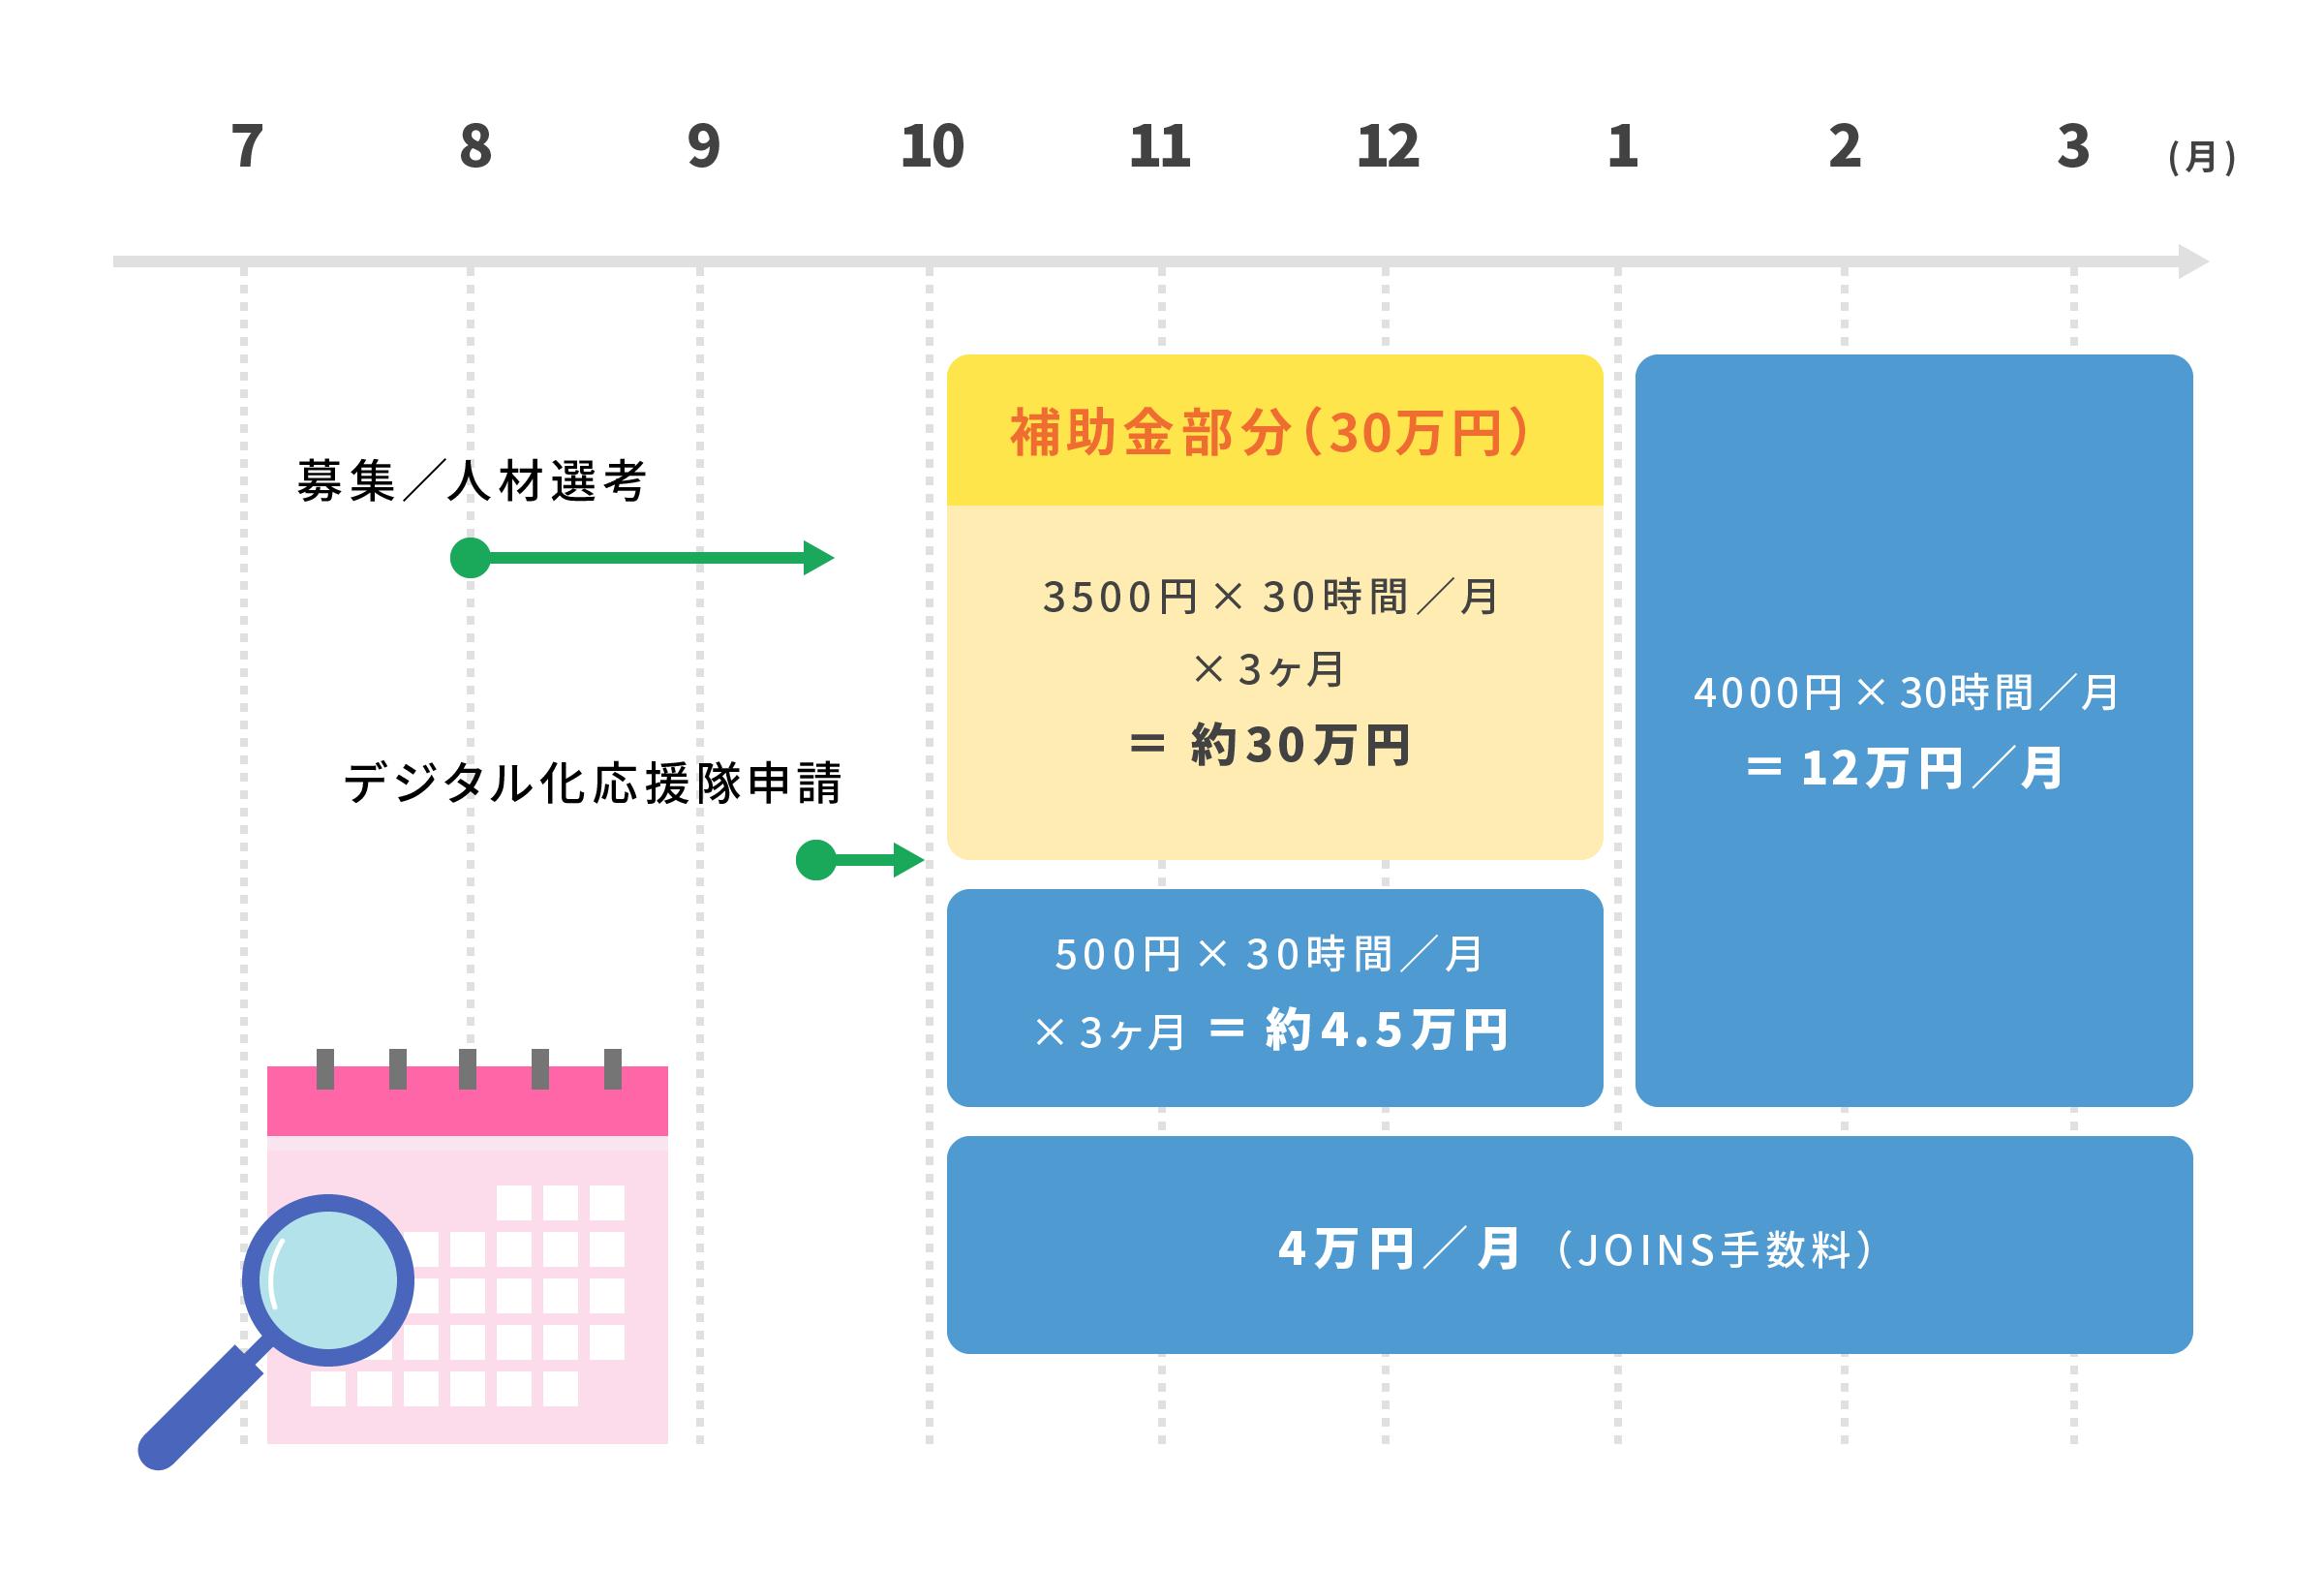 JOINSの活用スケジュールとイメージ